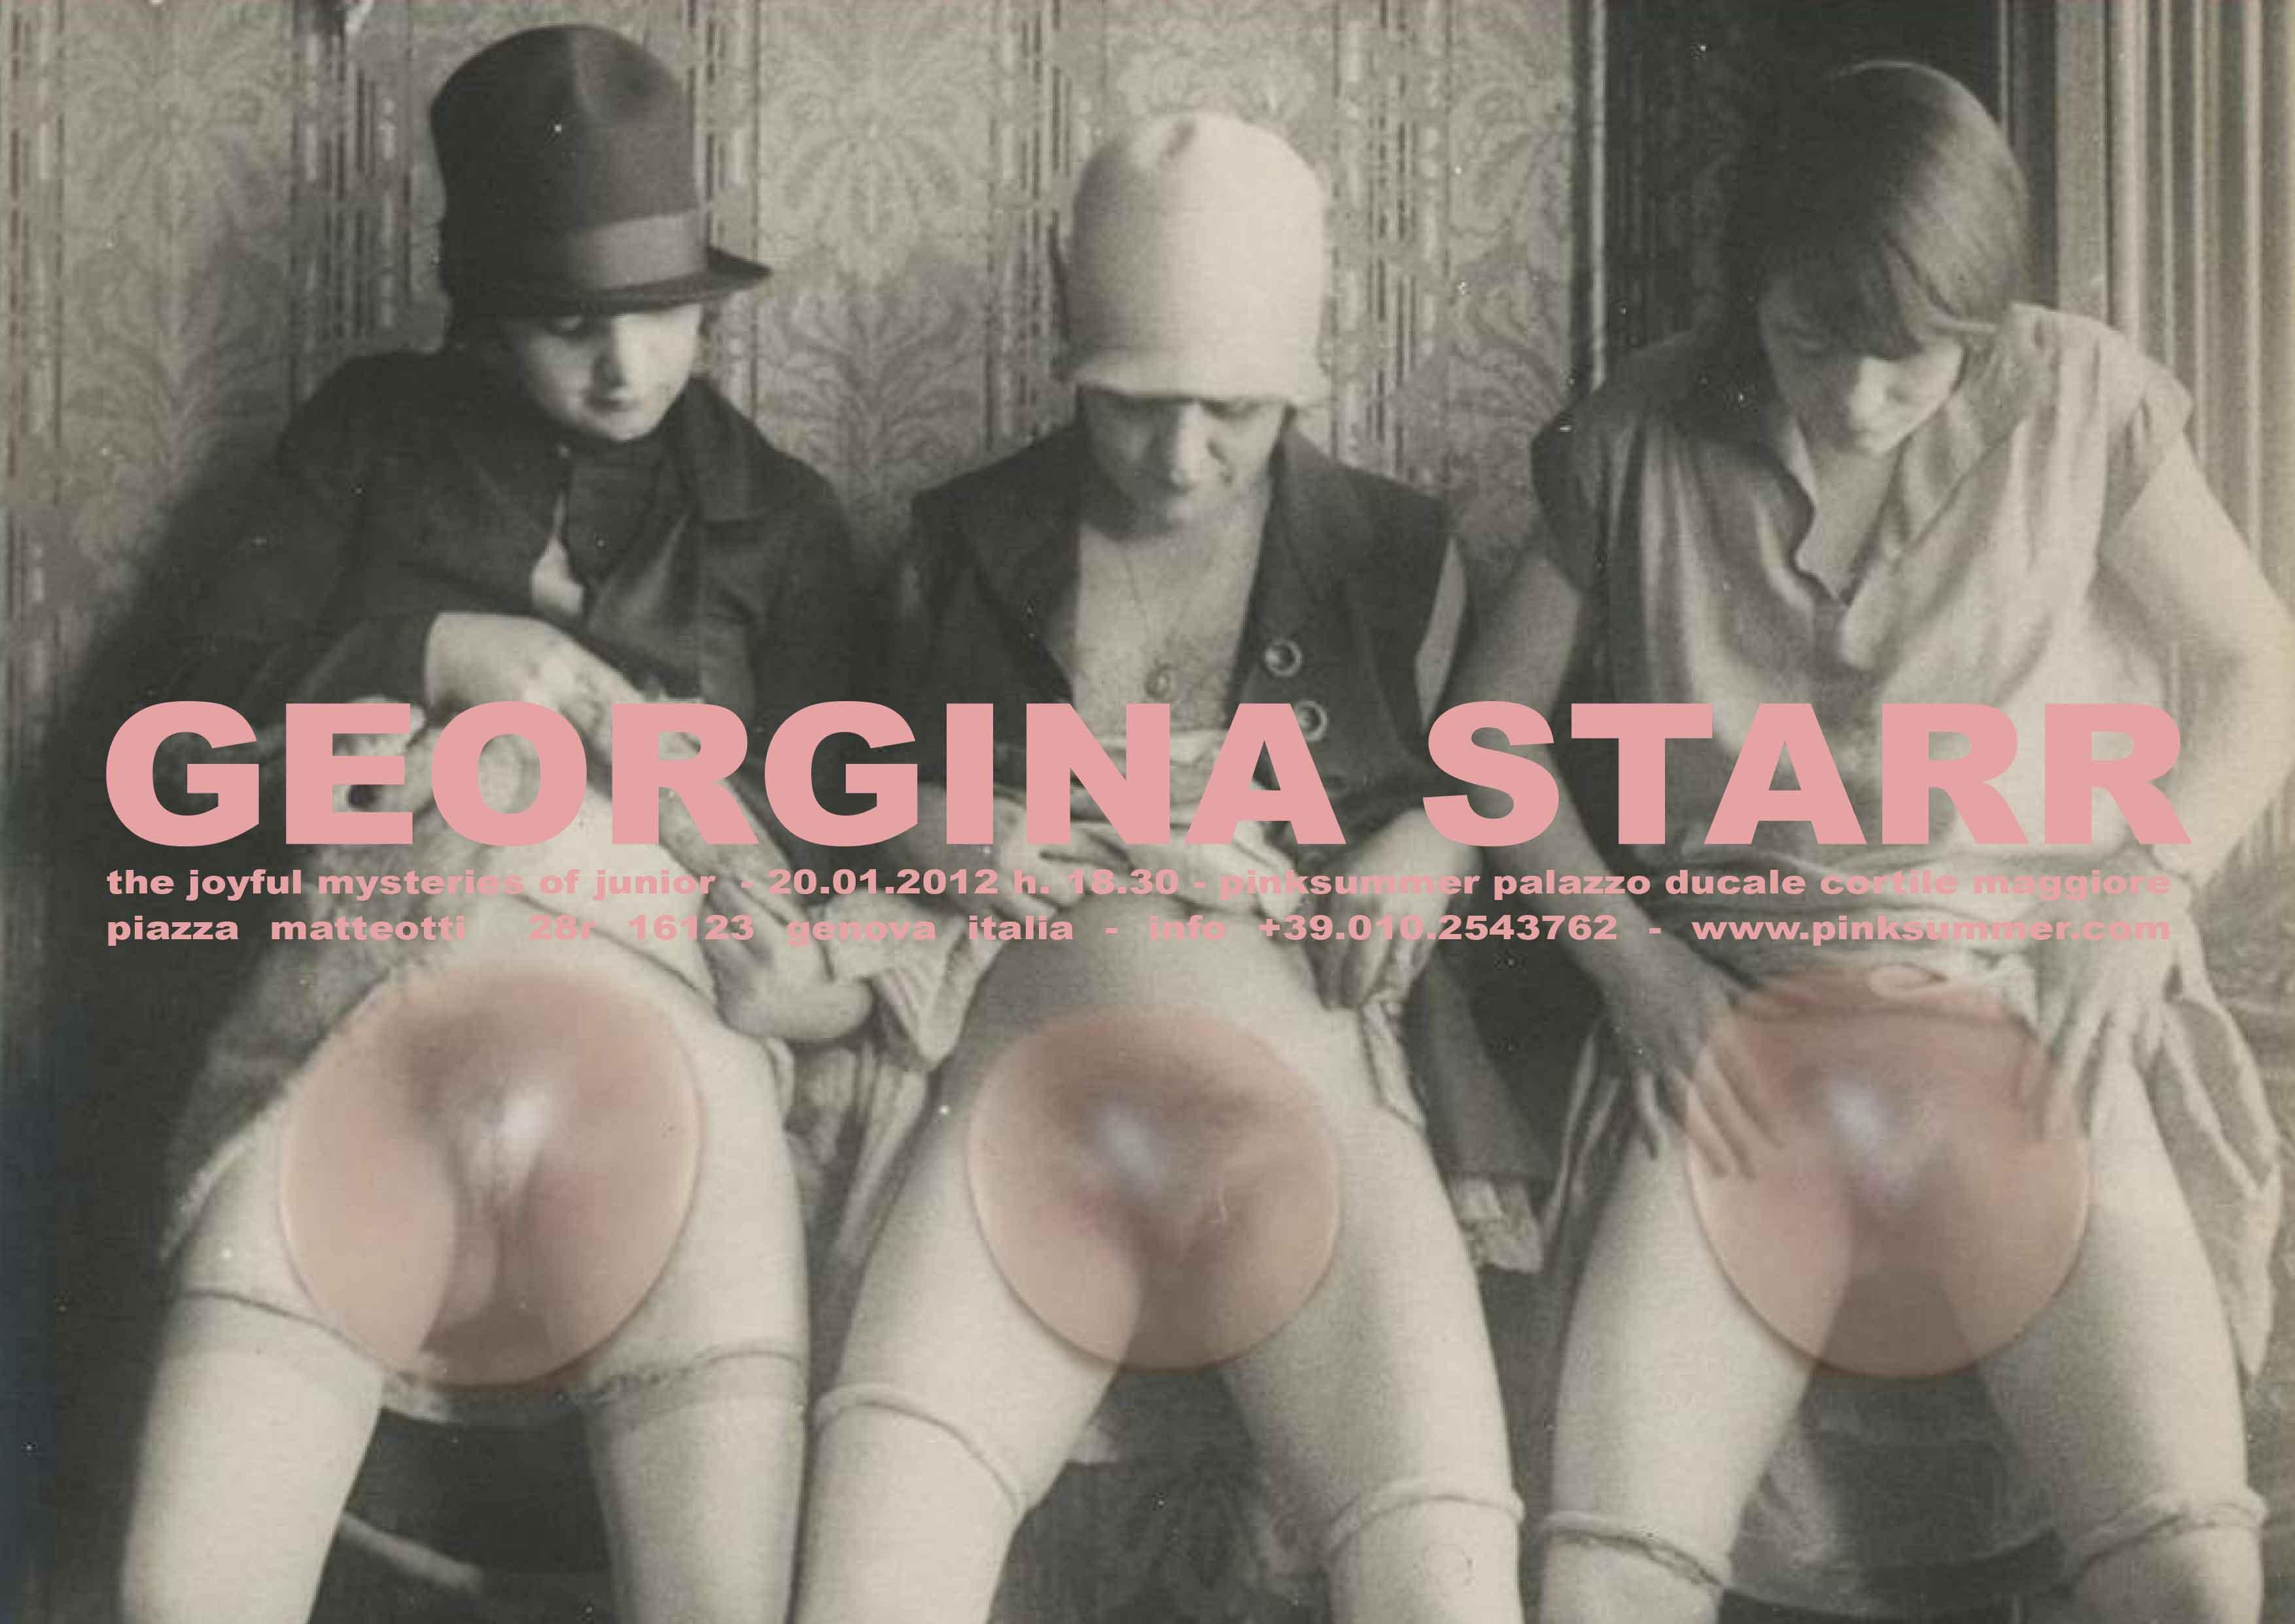 pinksummer-georgina-starr-the-joyful-mysteries-of-junior-invitation-card